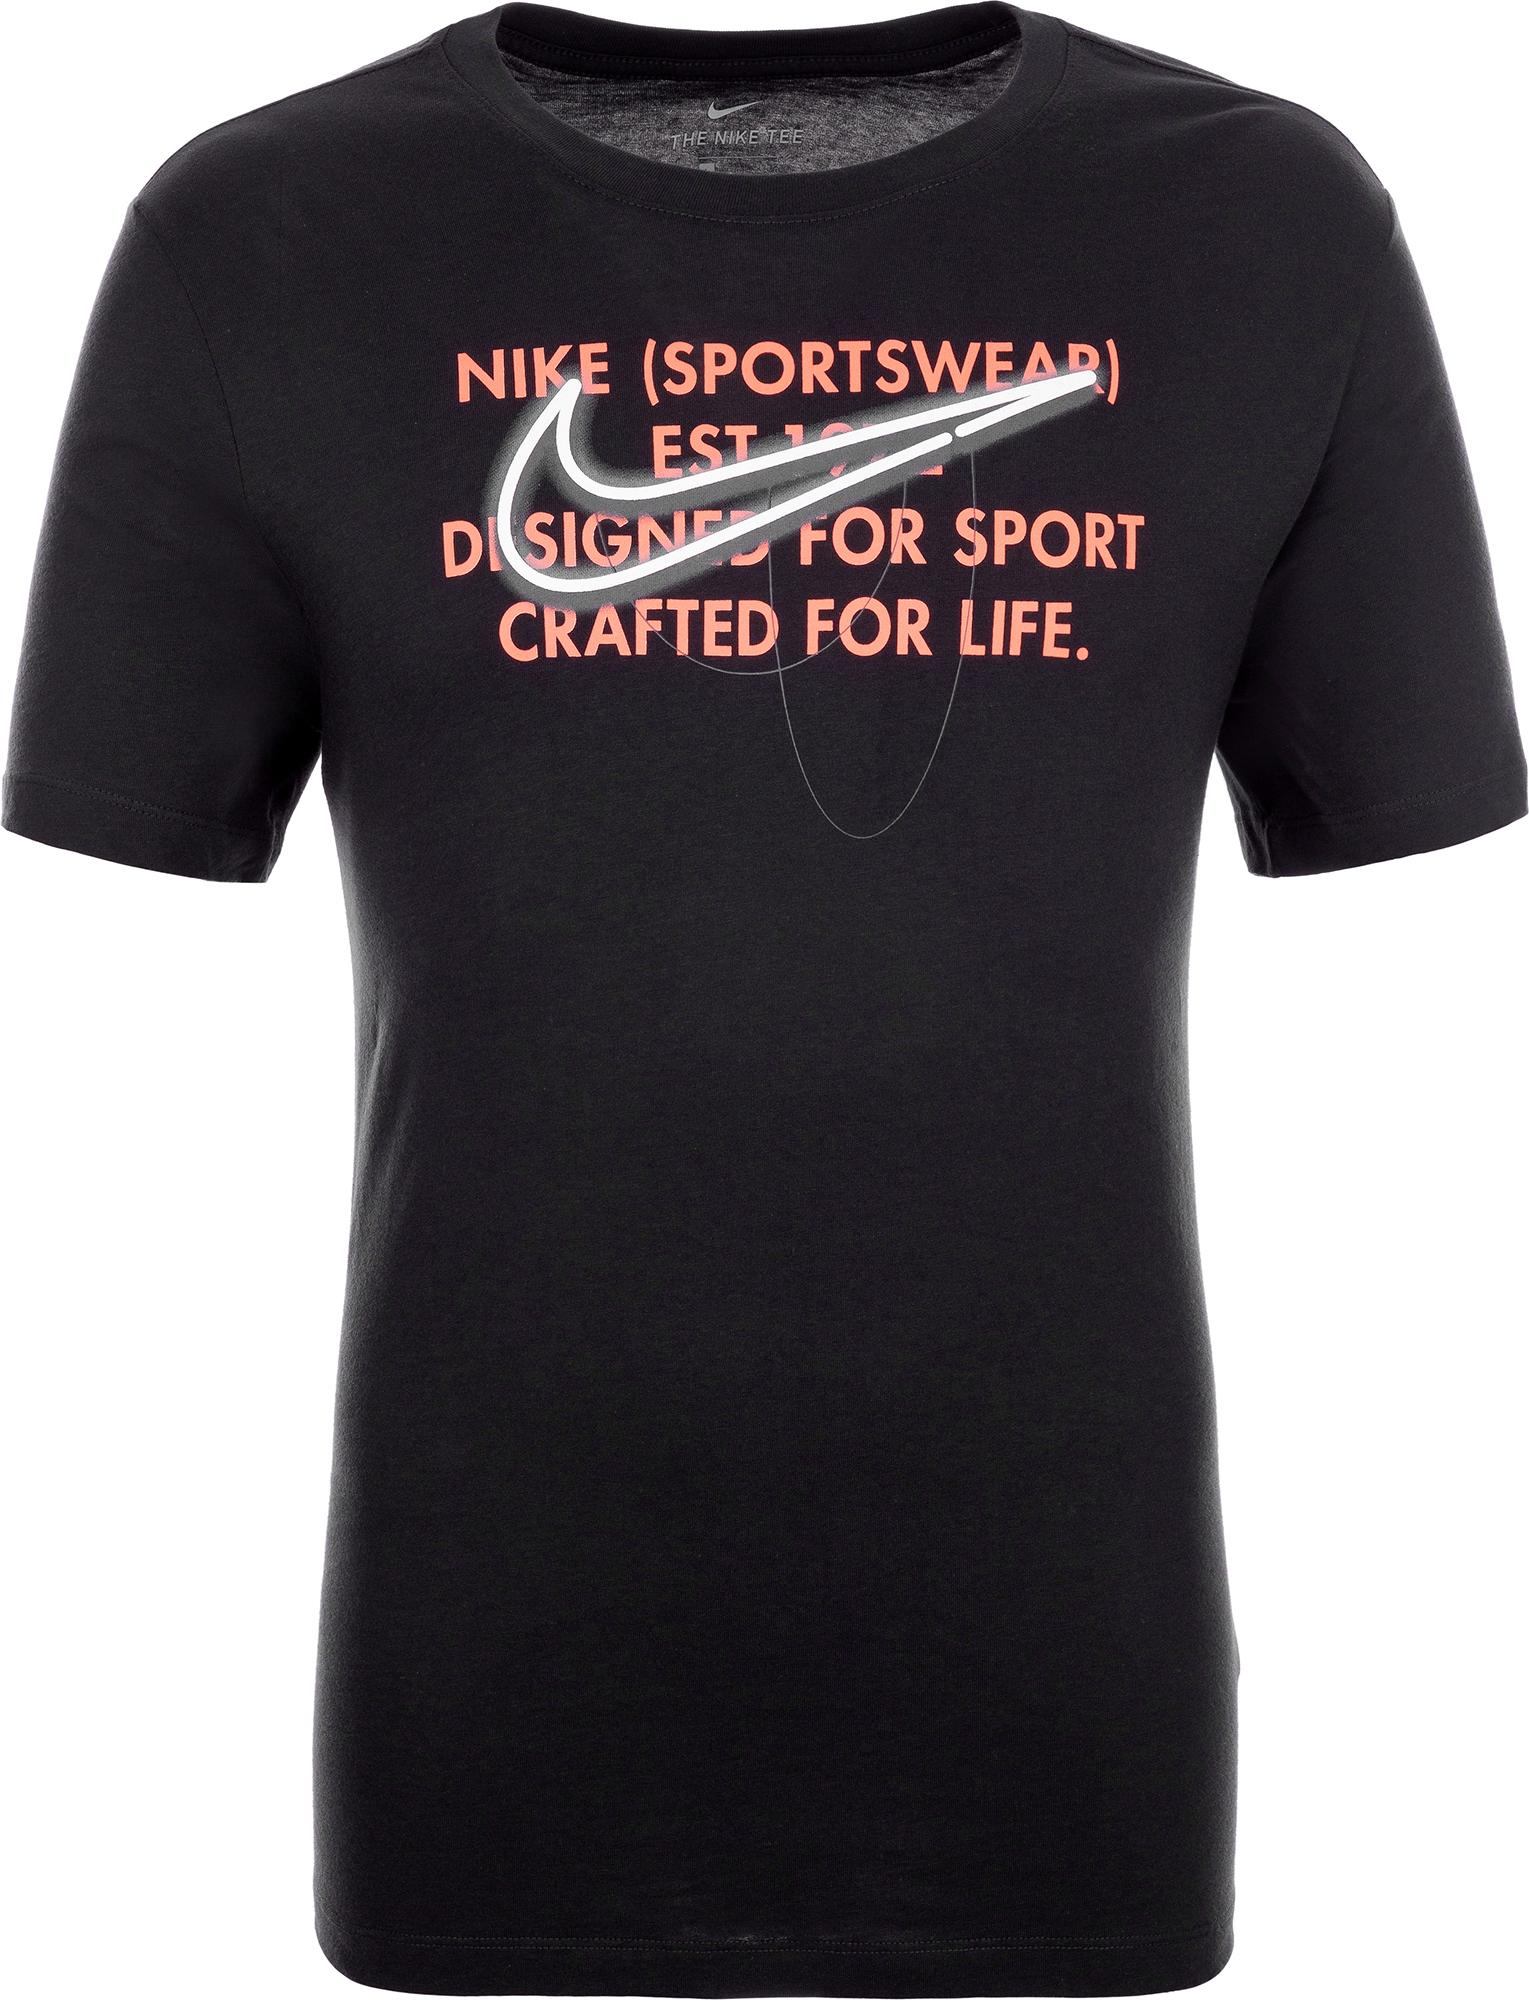 Nike Футболка мужская Nike, размер 52-54 цена 2017